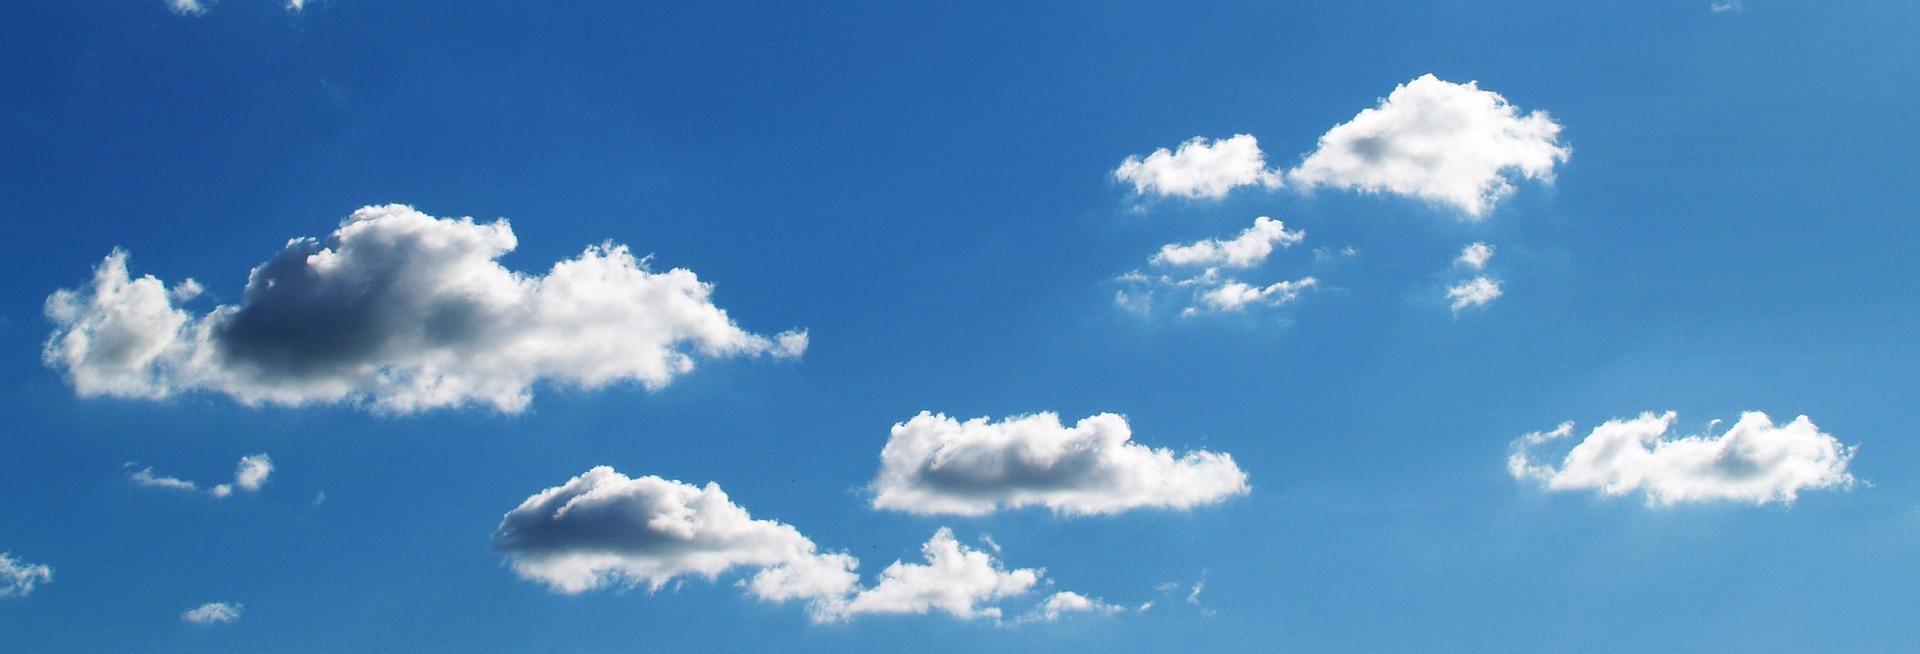 ozon hoog dosis therapie